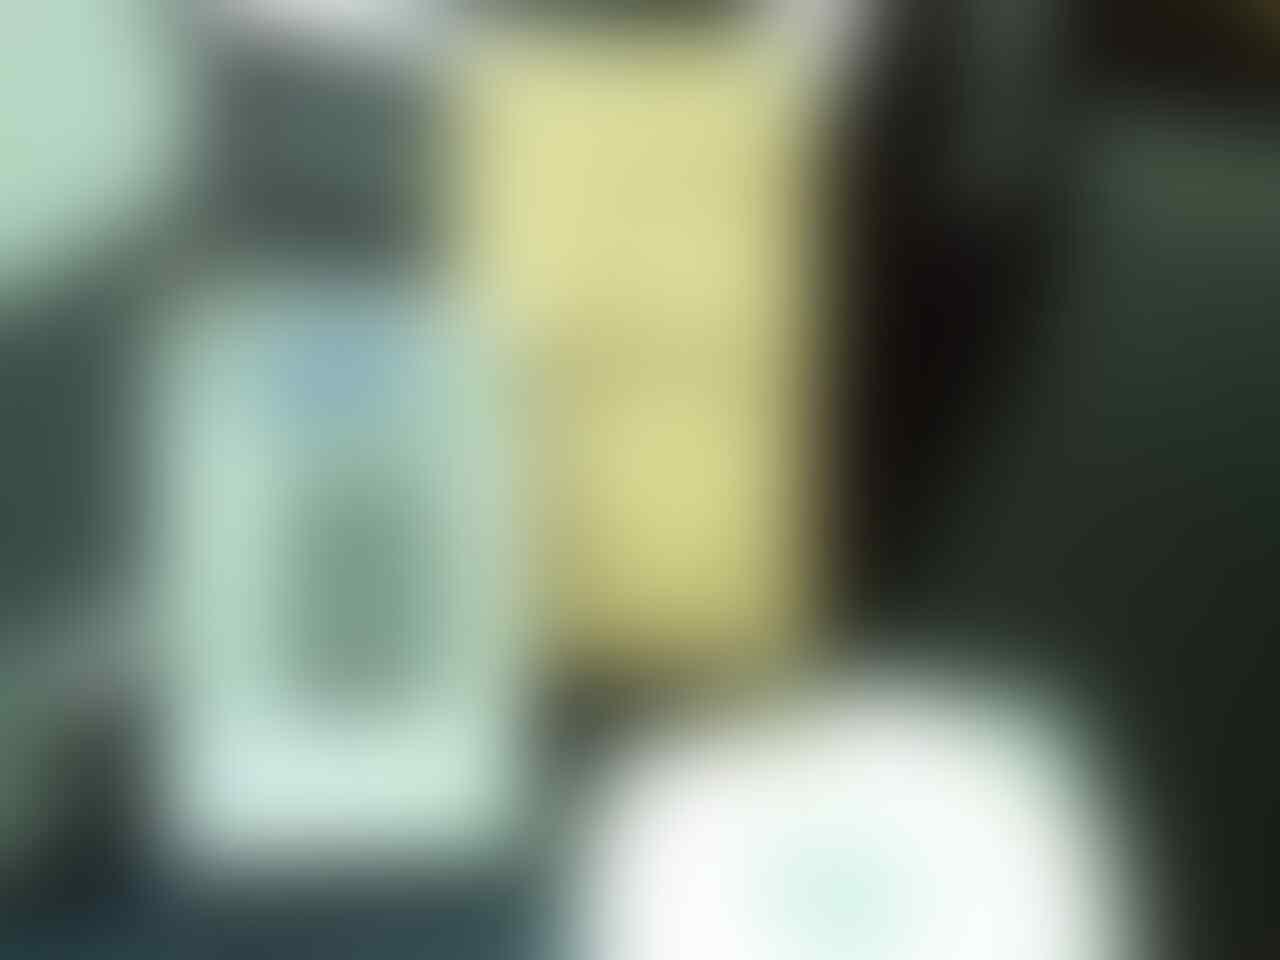 READY STOCK - ALL TYPE IPHONE - ORIGINAL NEW BUKAN REPLIKA - BARANG BARU HARGA MURAH